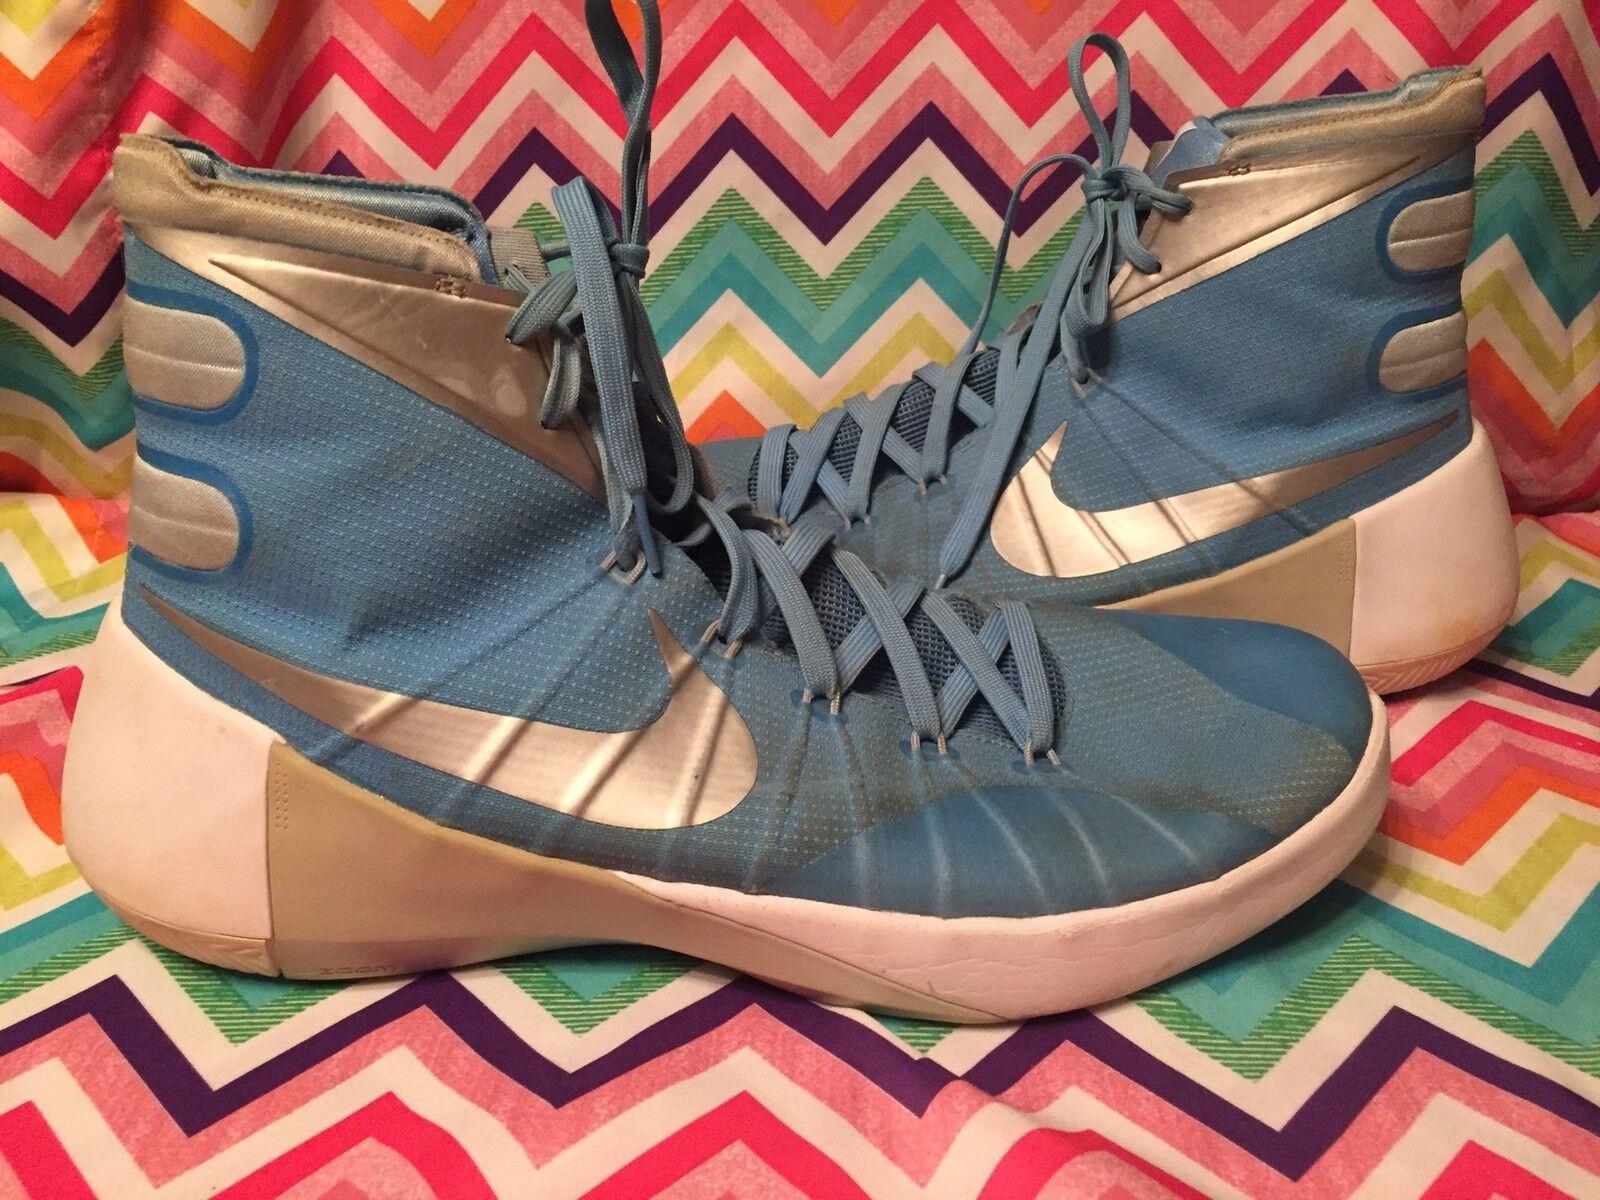 Nike Hyperdunk 2015 University bluee Icebluee White 749645-403 Size 14